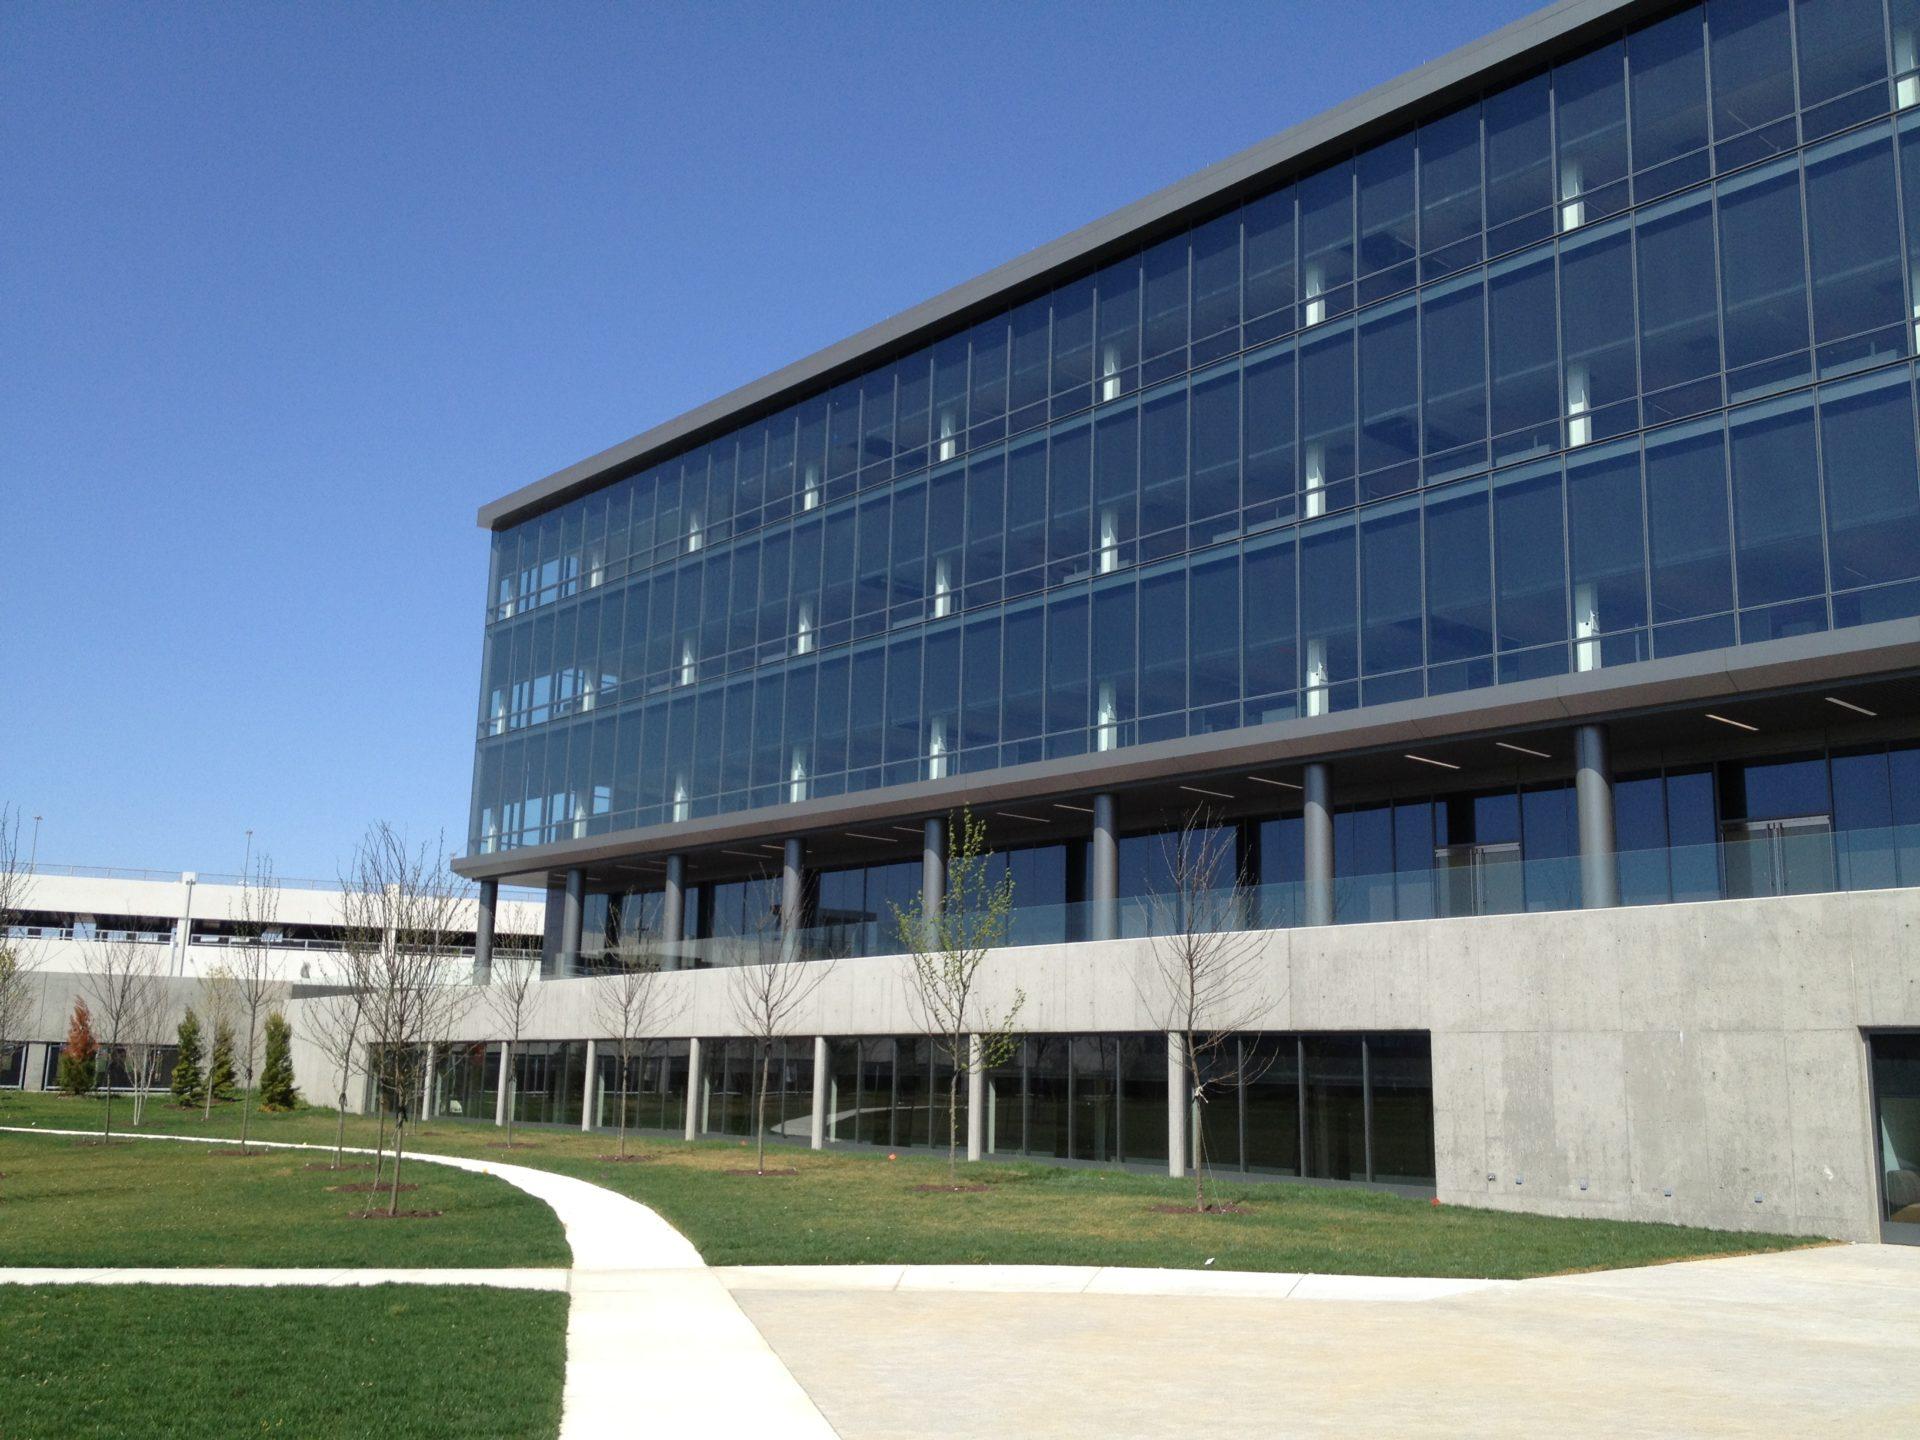 Base Building